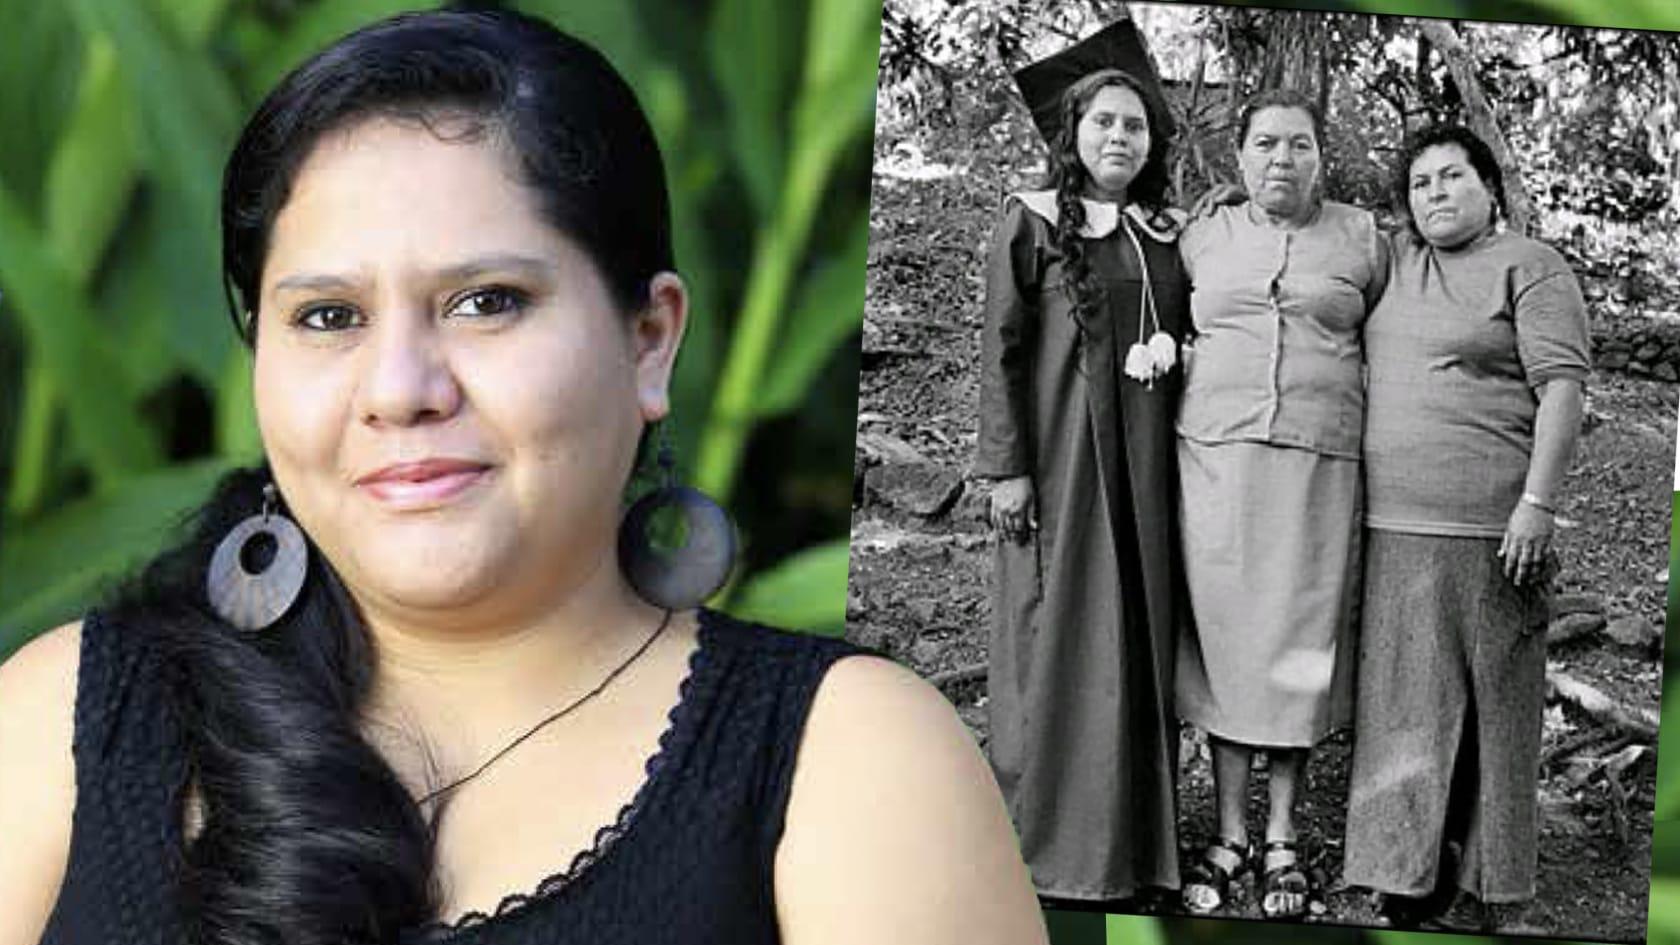 Her Family Survived the El Mozote Massacre. Now She's Fleeing El Salvador's Gangs.